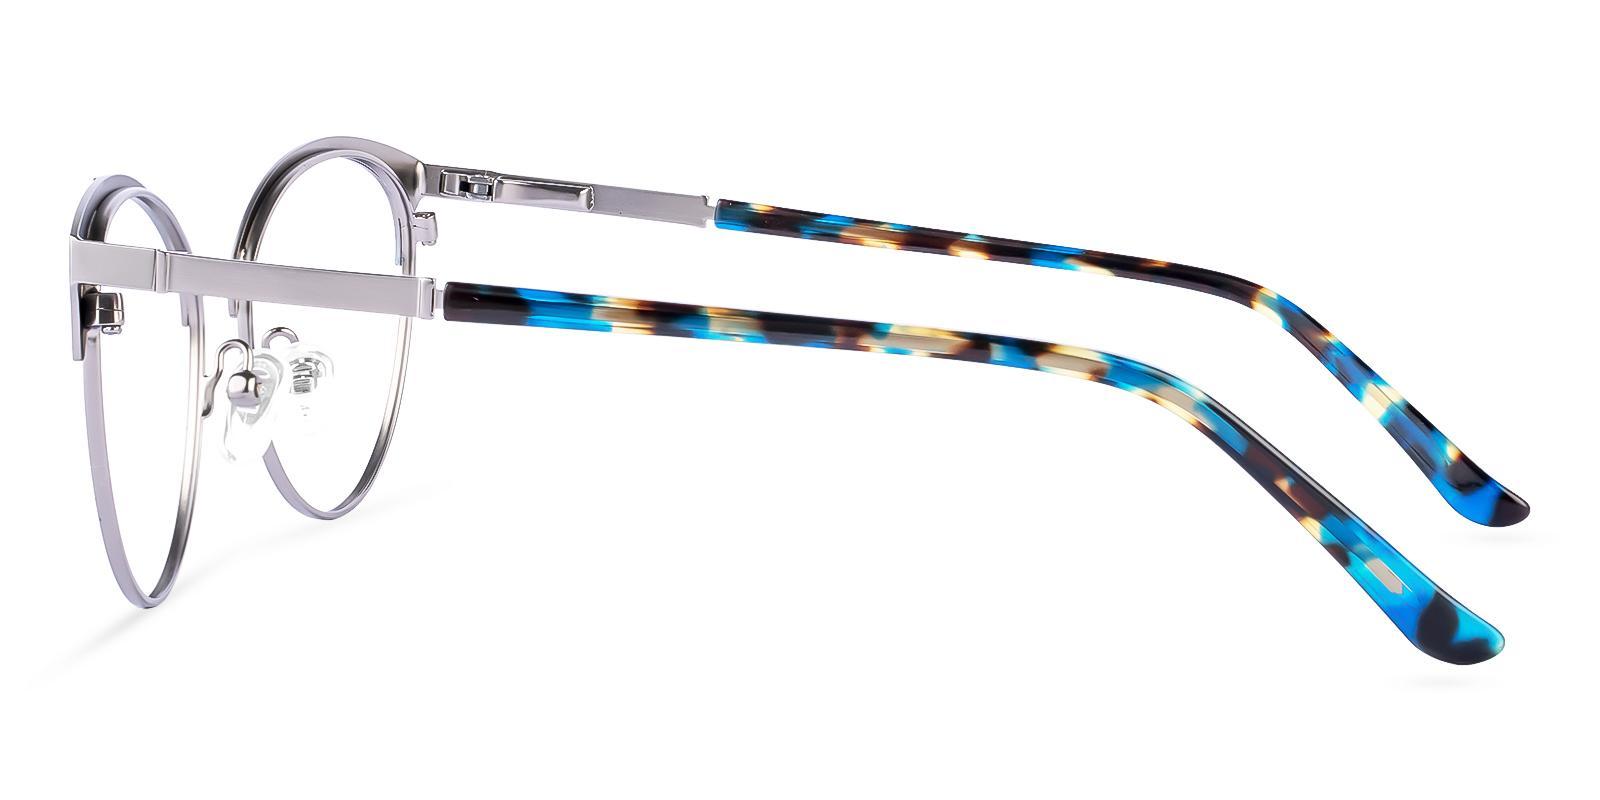 Huxley Blue Metal Eyeglasses , Fashion , NosePads , SpringHinges Frames from ABBE Glasses